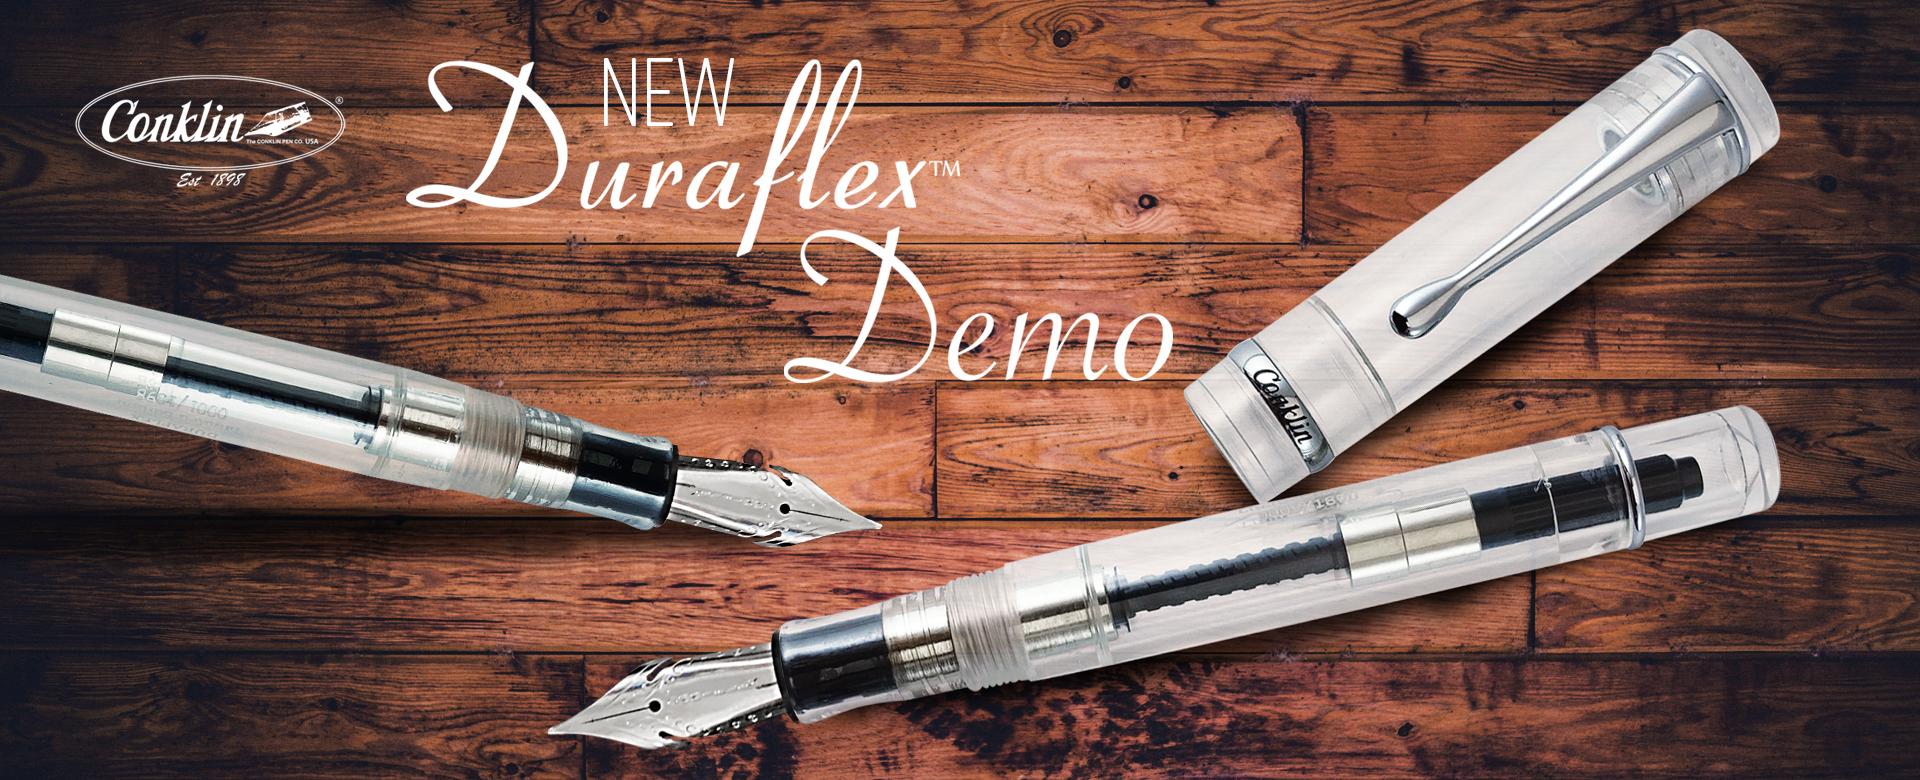 duraflex-demo-pen-banner.jpg